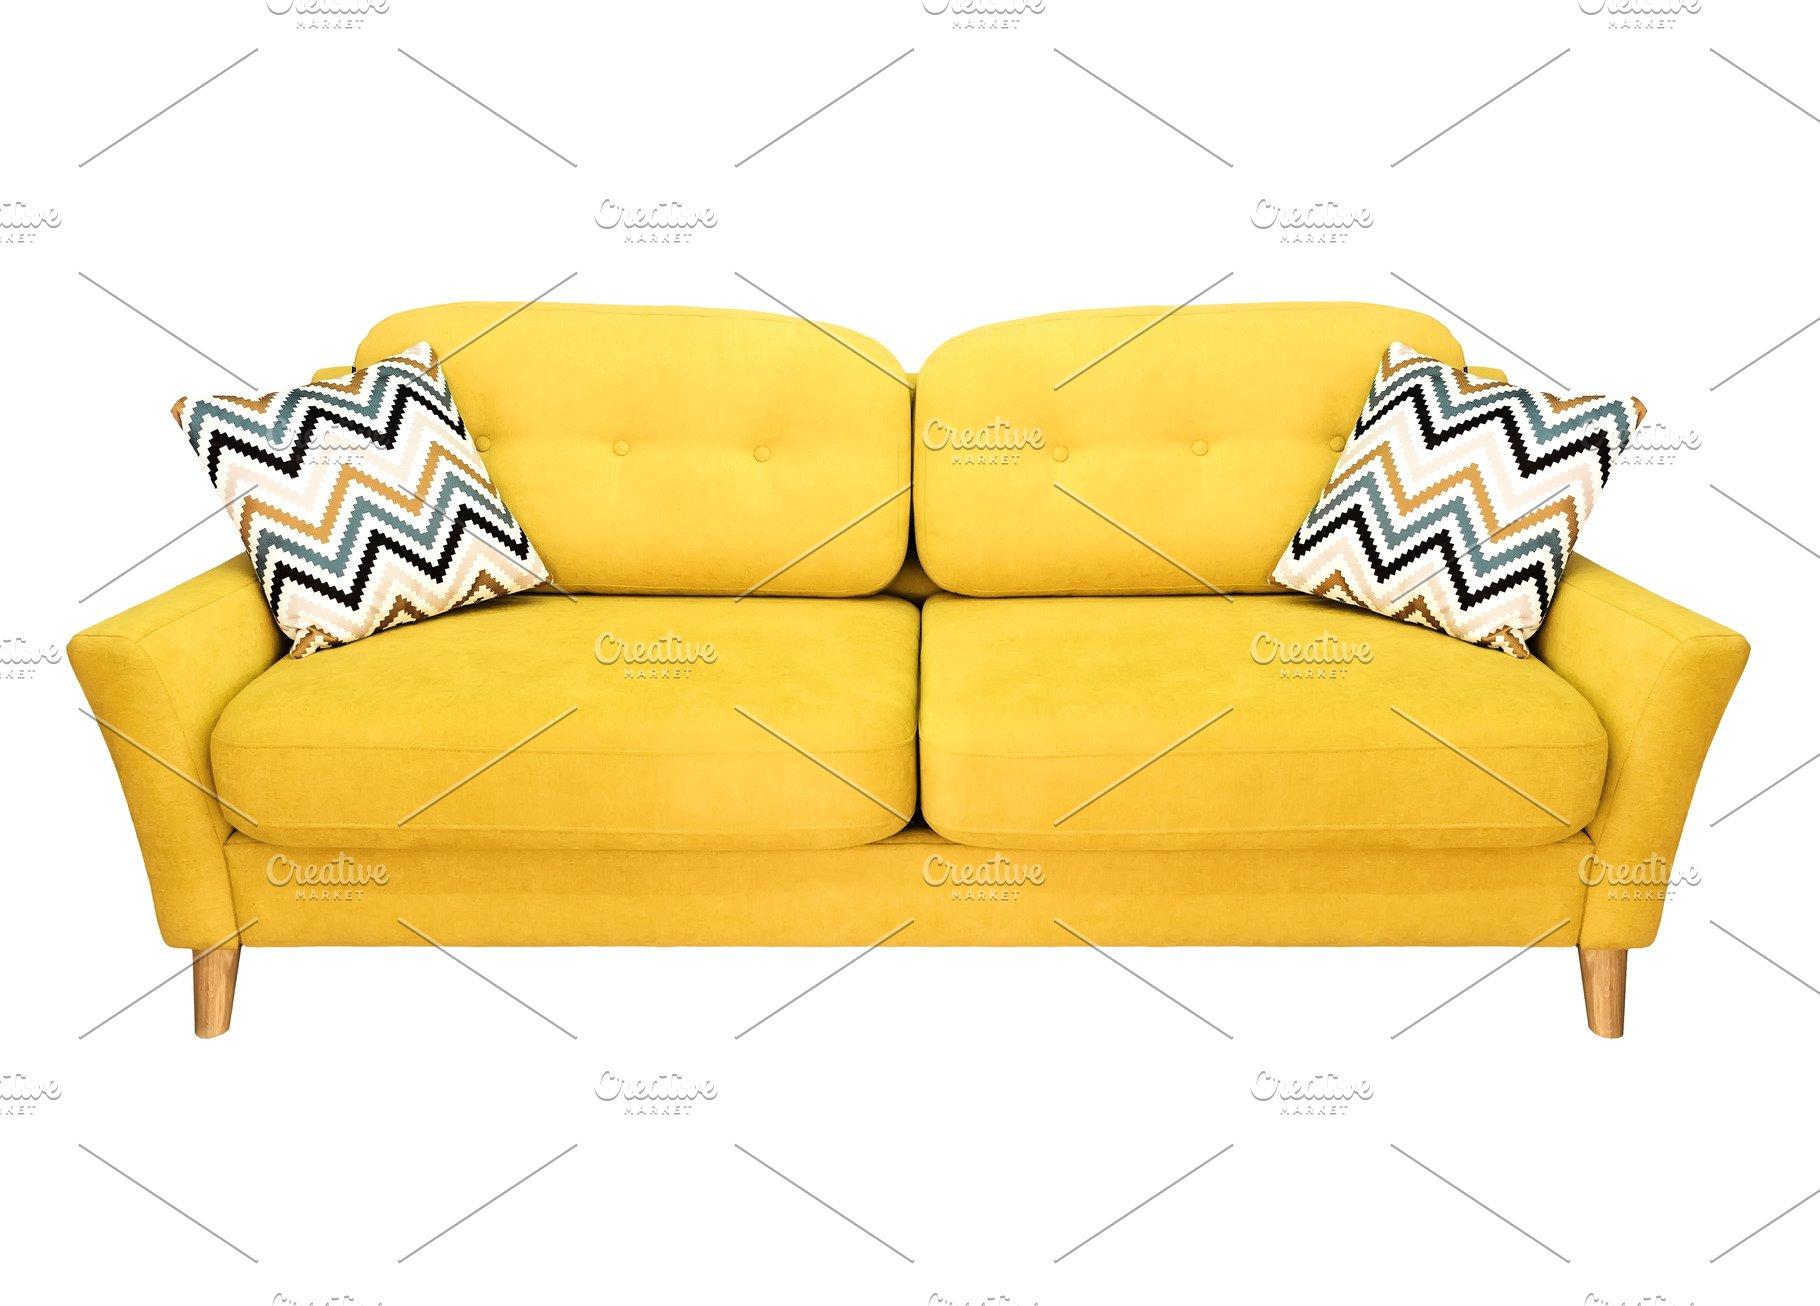 Green lemon yellow sofa with pillow.